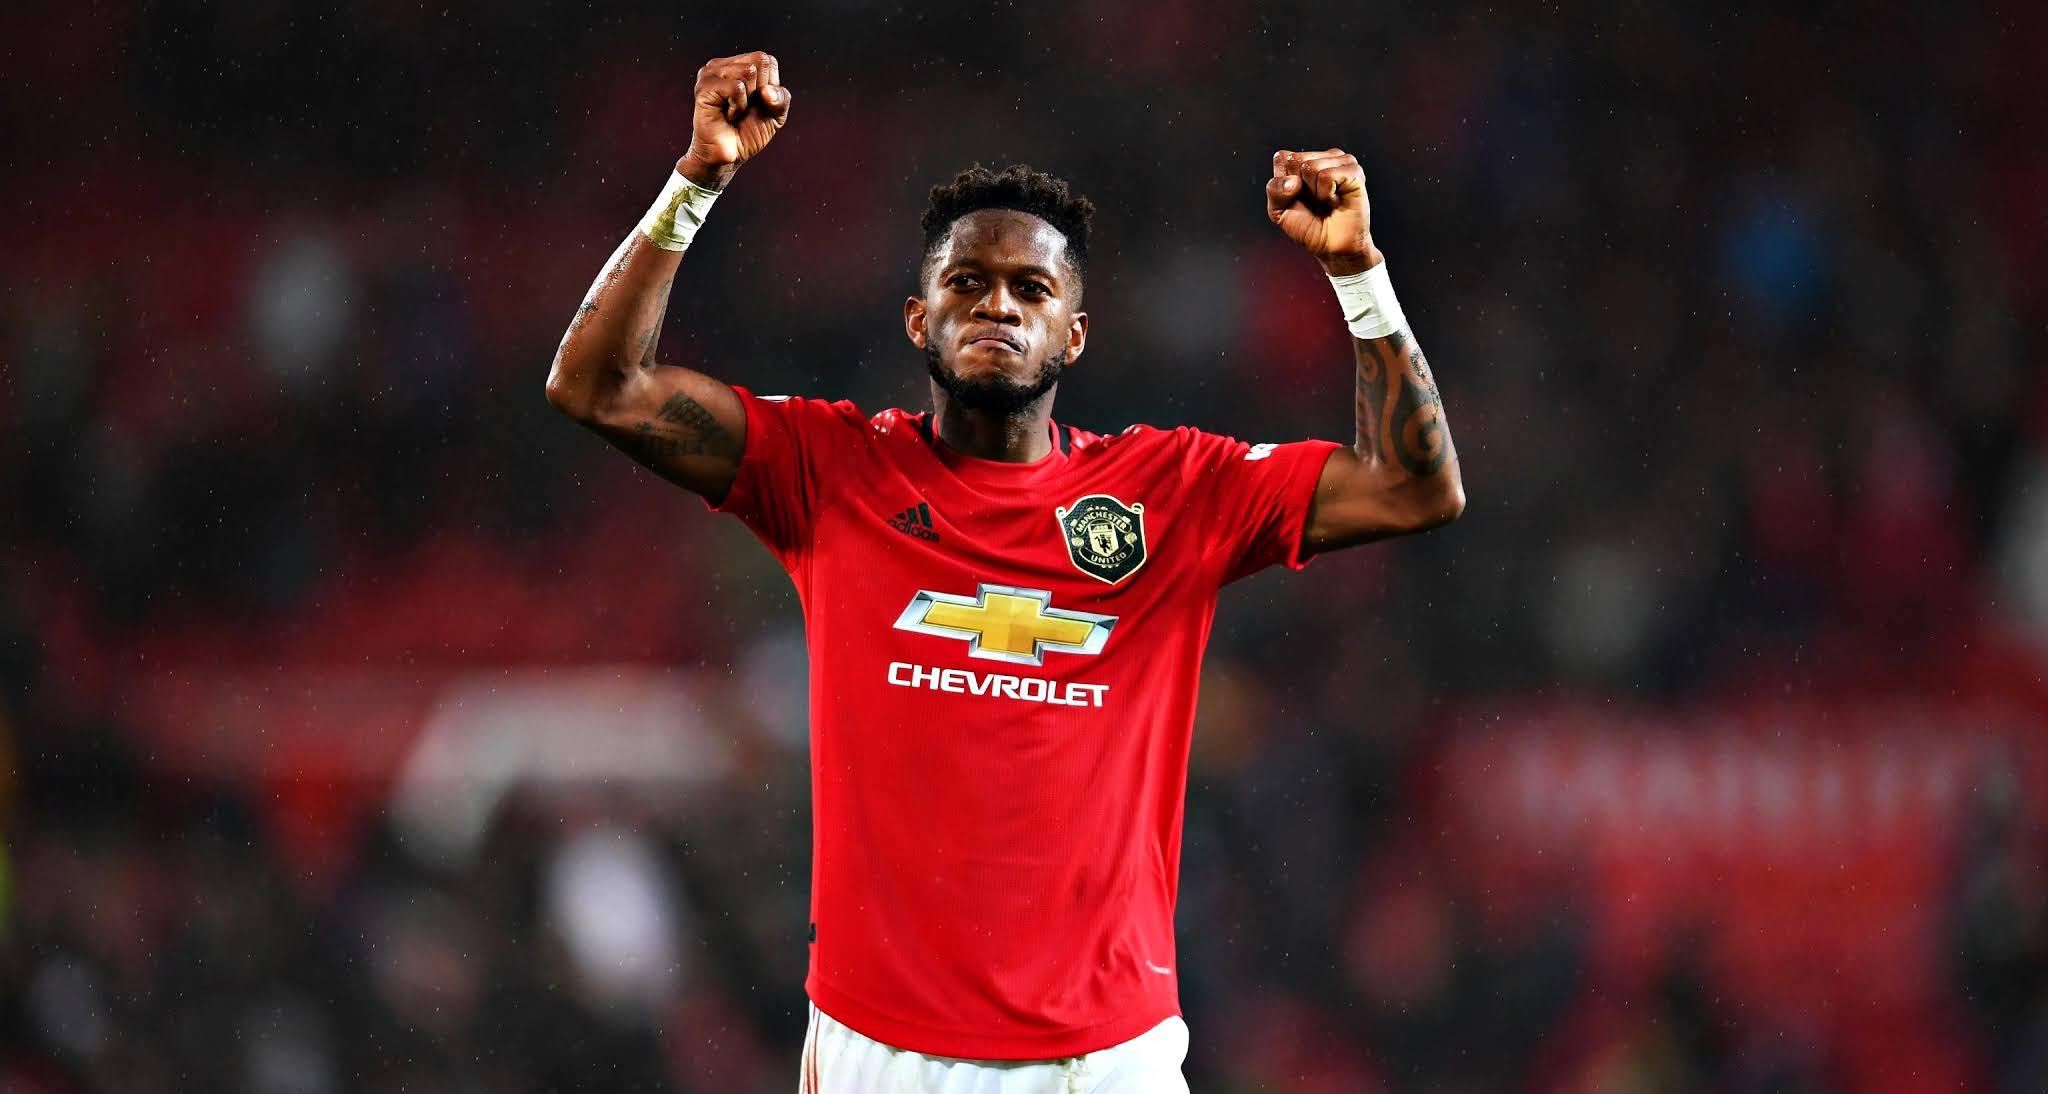 Fred: Manchester United'da kalmak istiyorum.